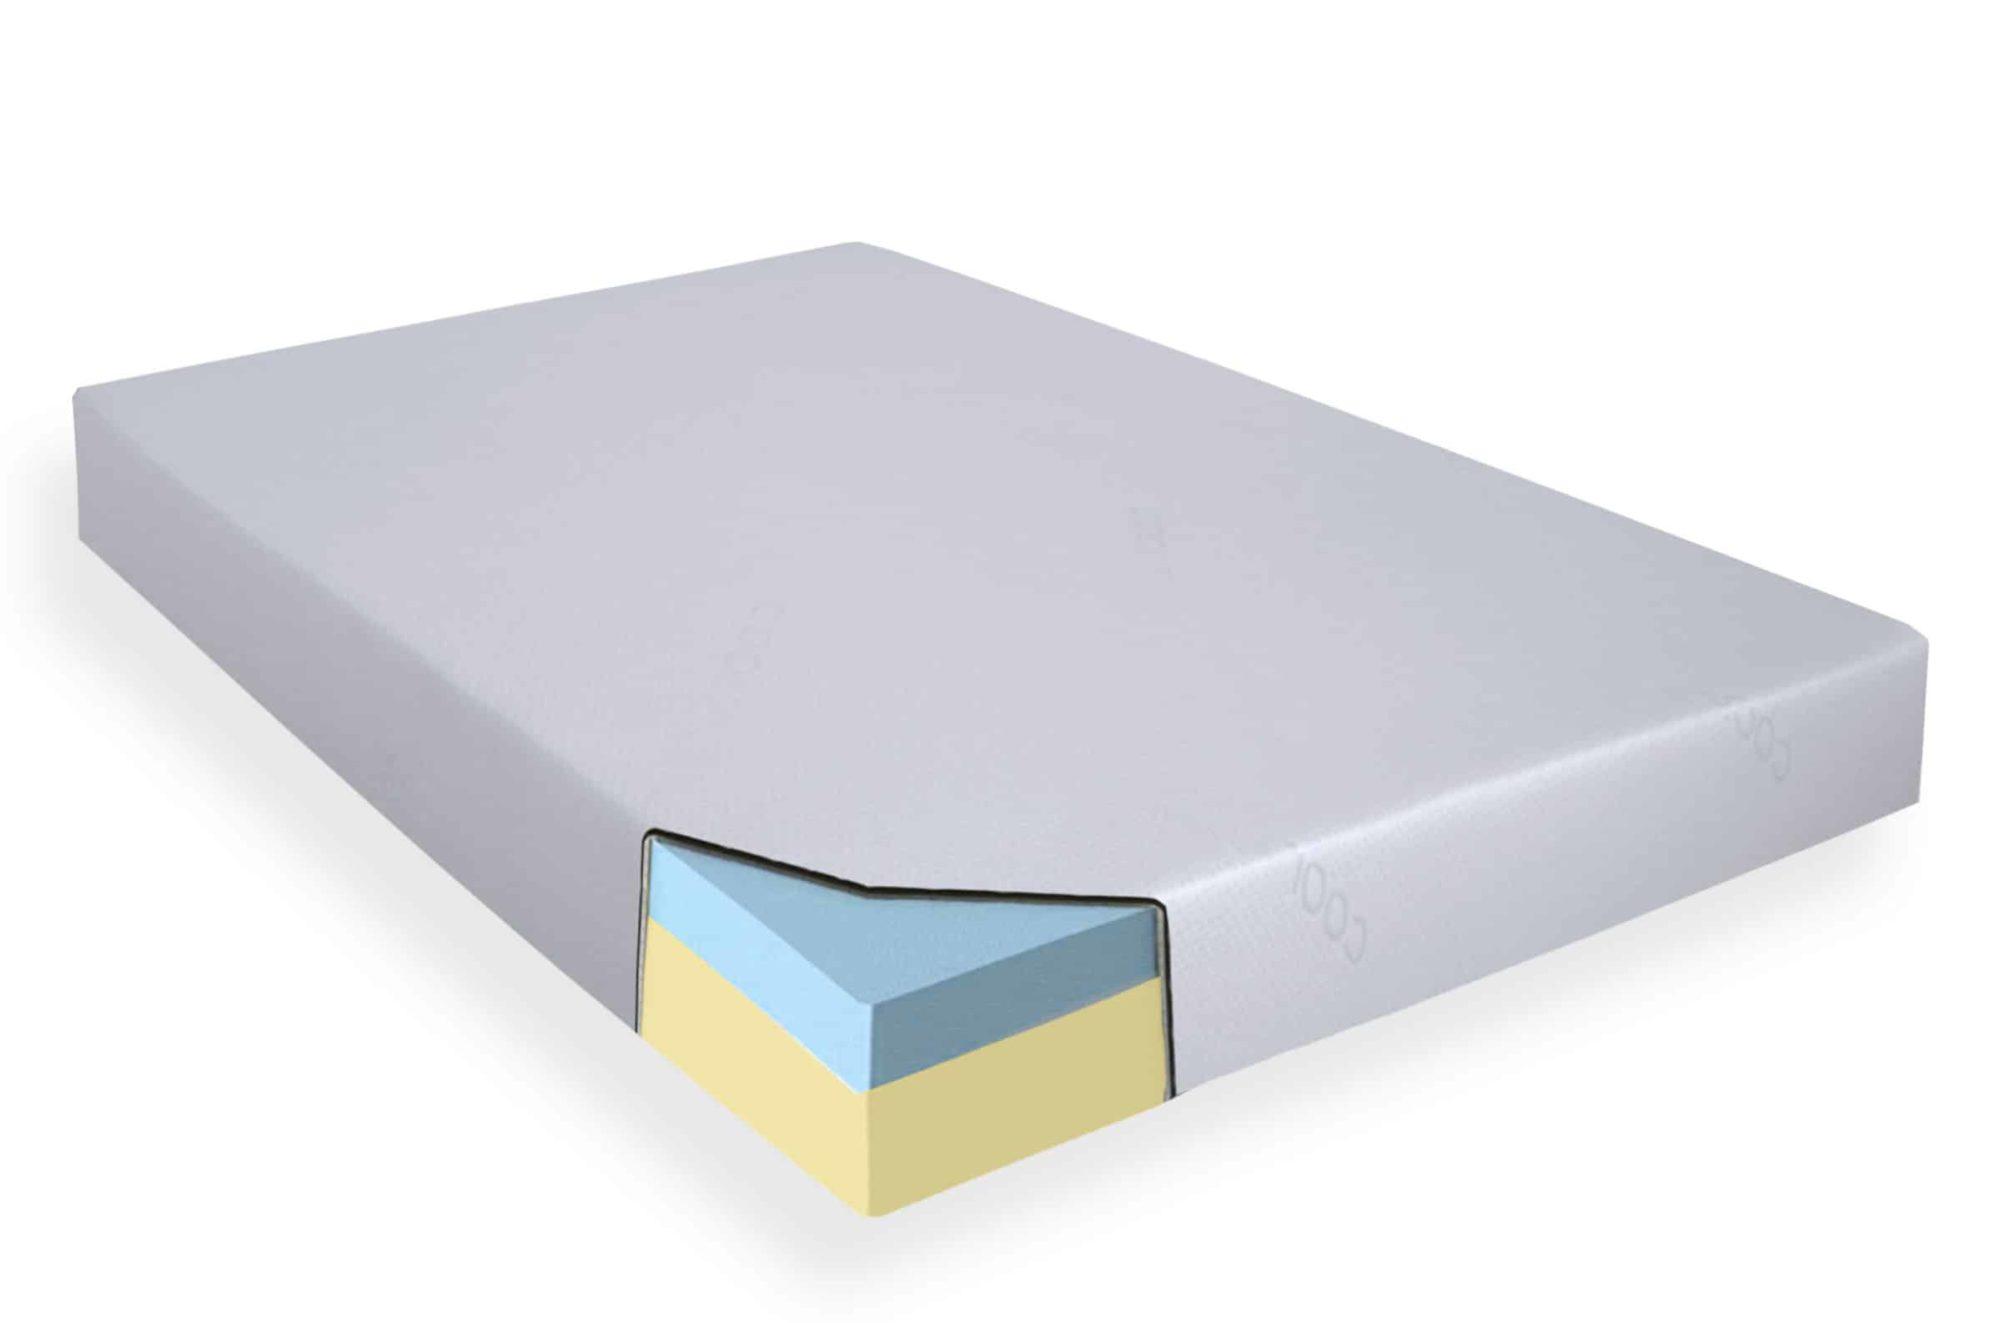 Double-wooden-bed-5-460x460.jpg